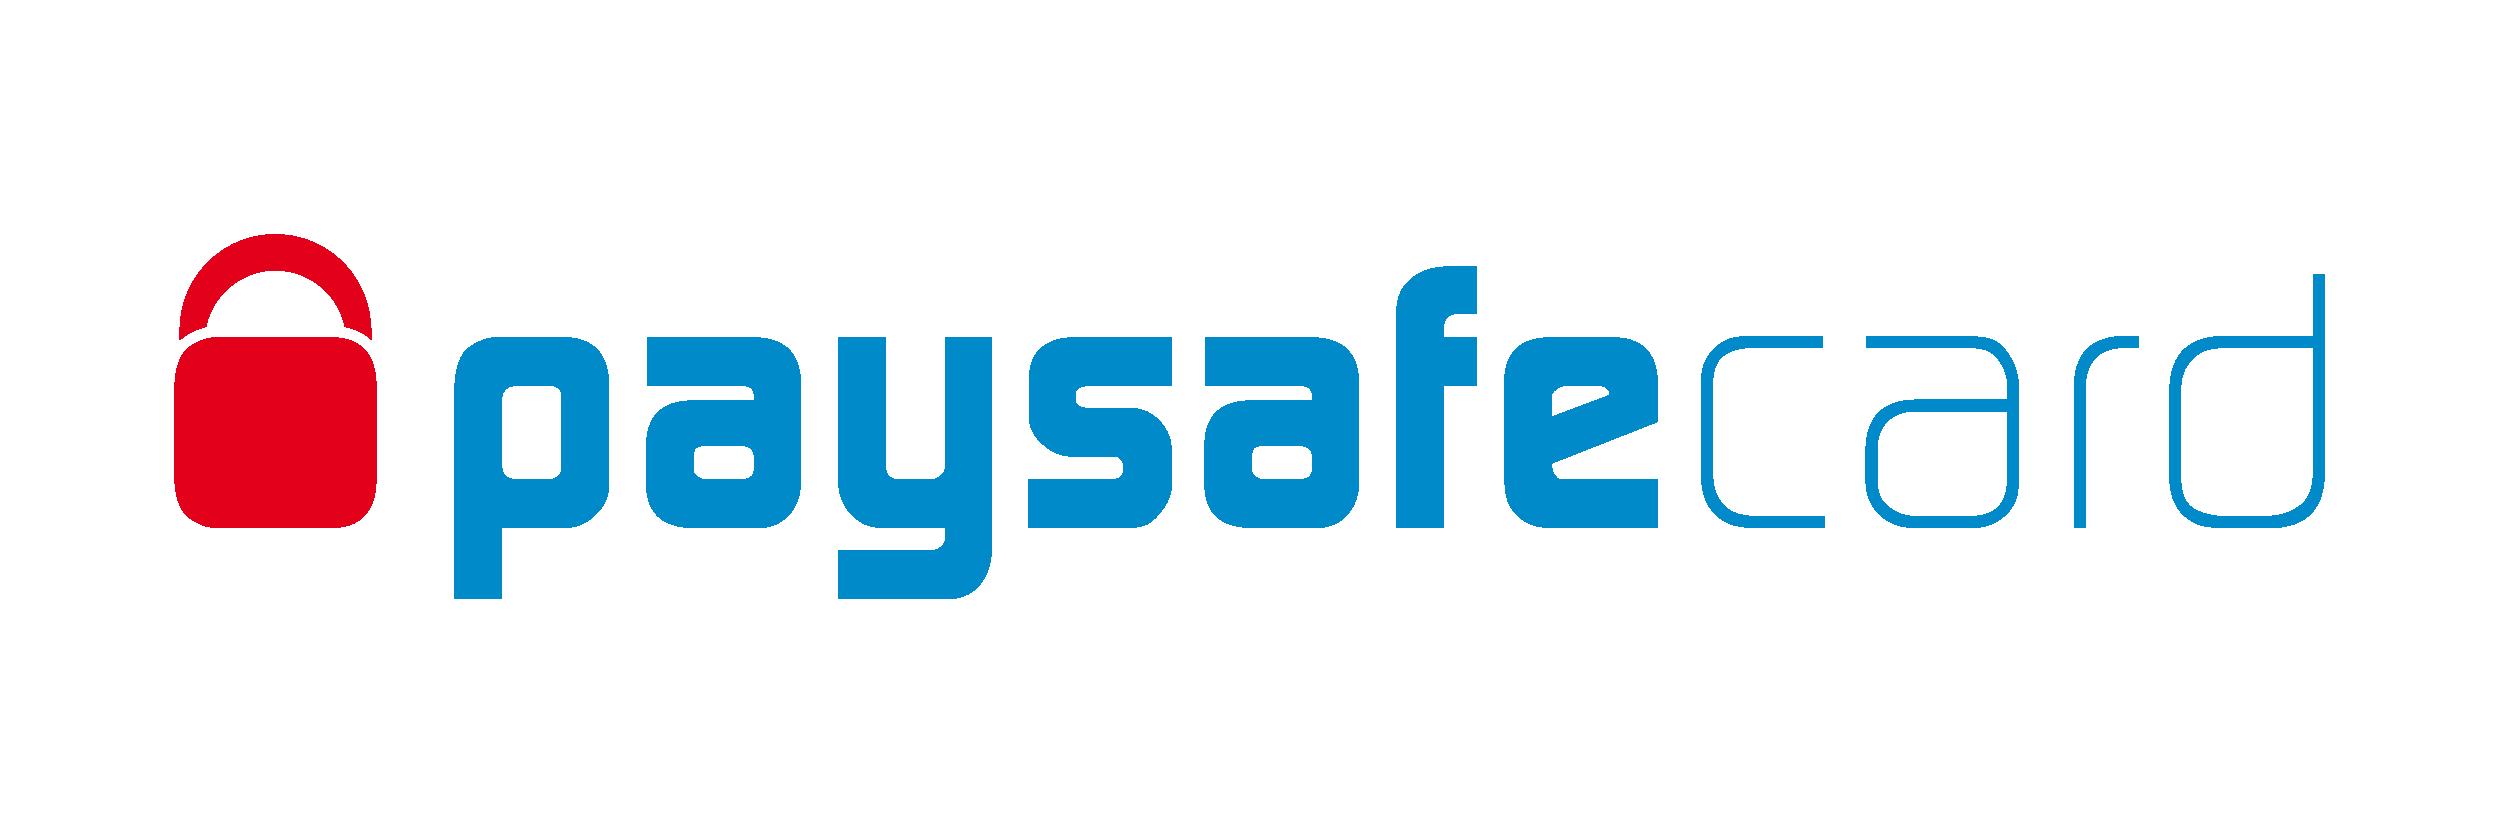 www.paysafecard.com shop und produkt